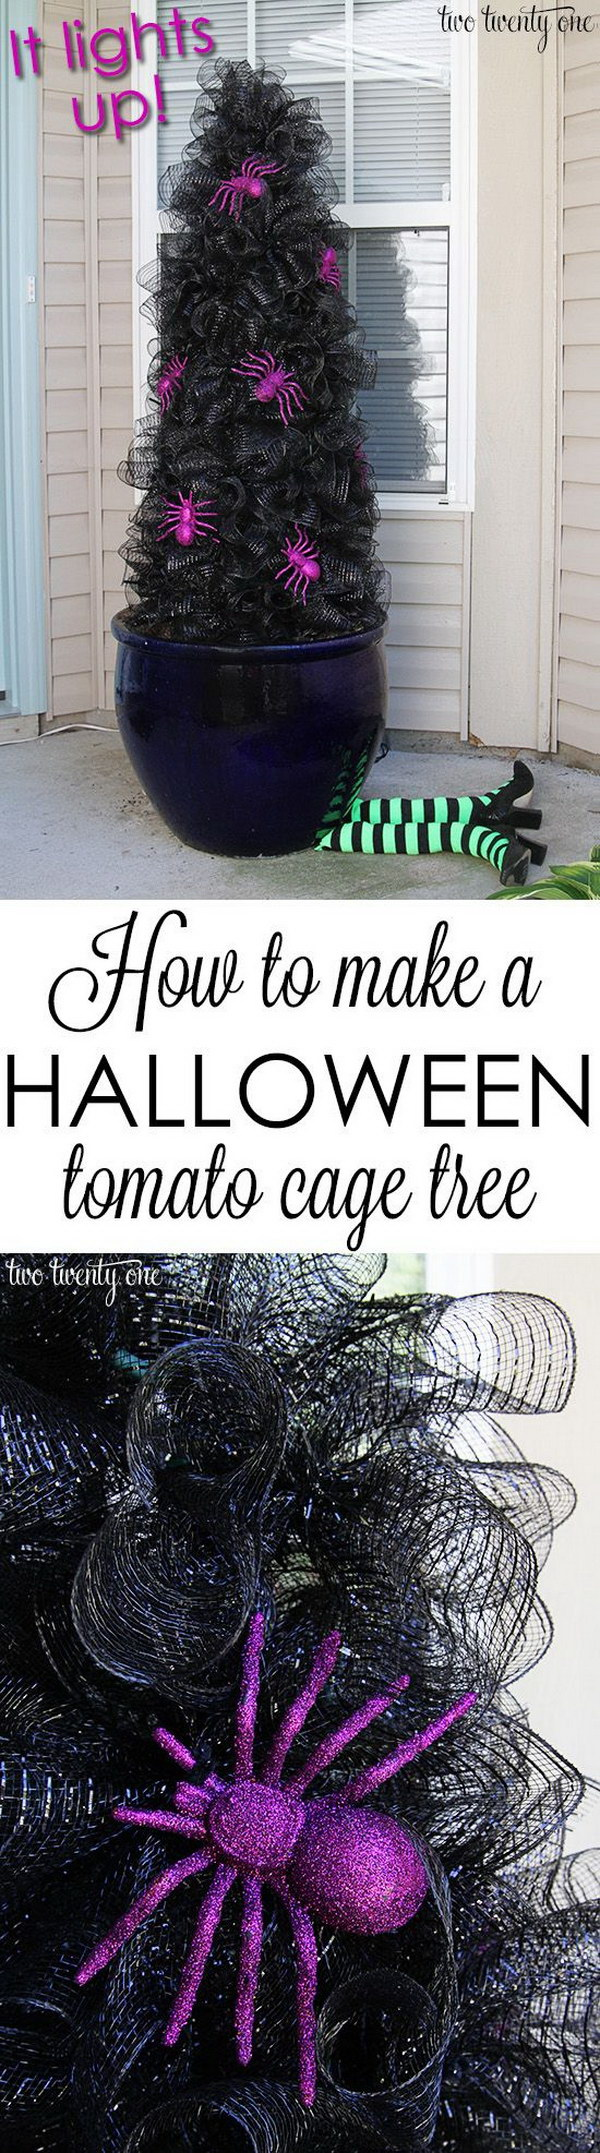 DIY Halloween Tomato Cage Tree